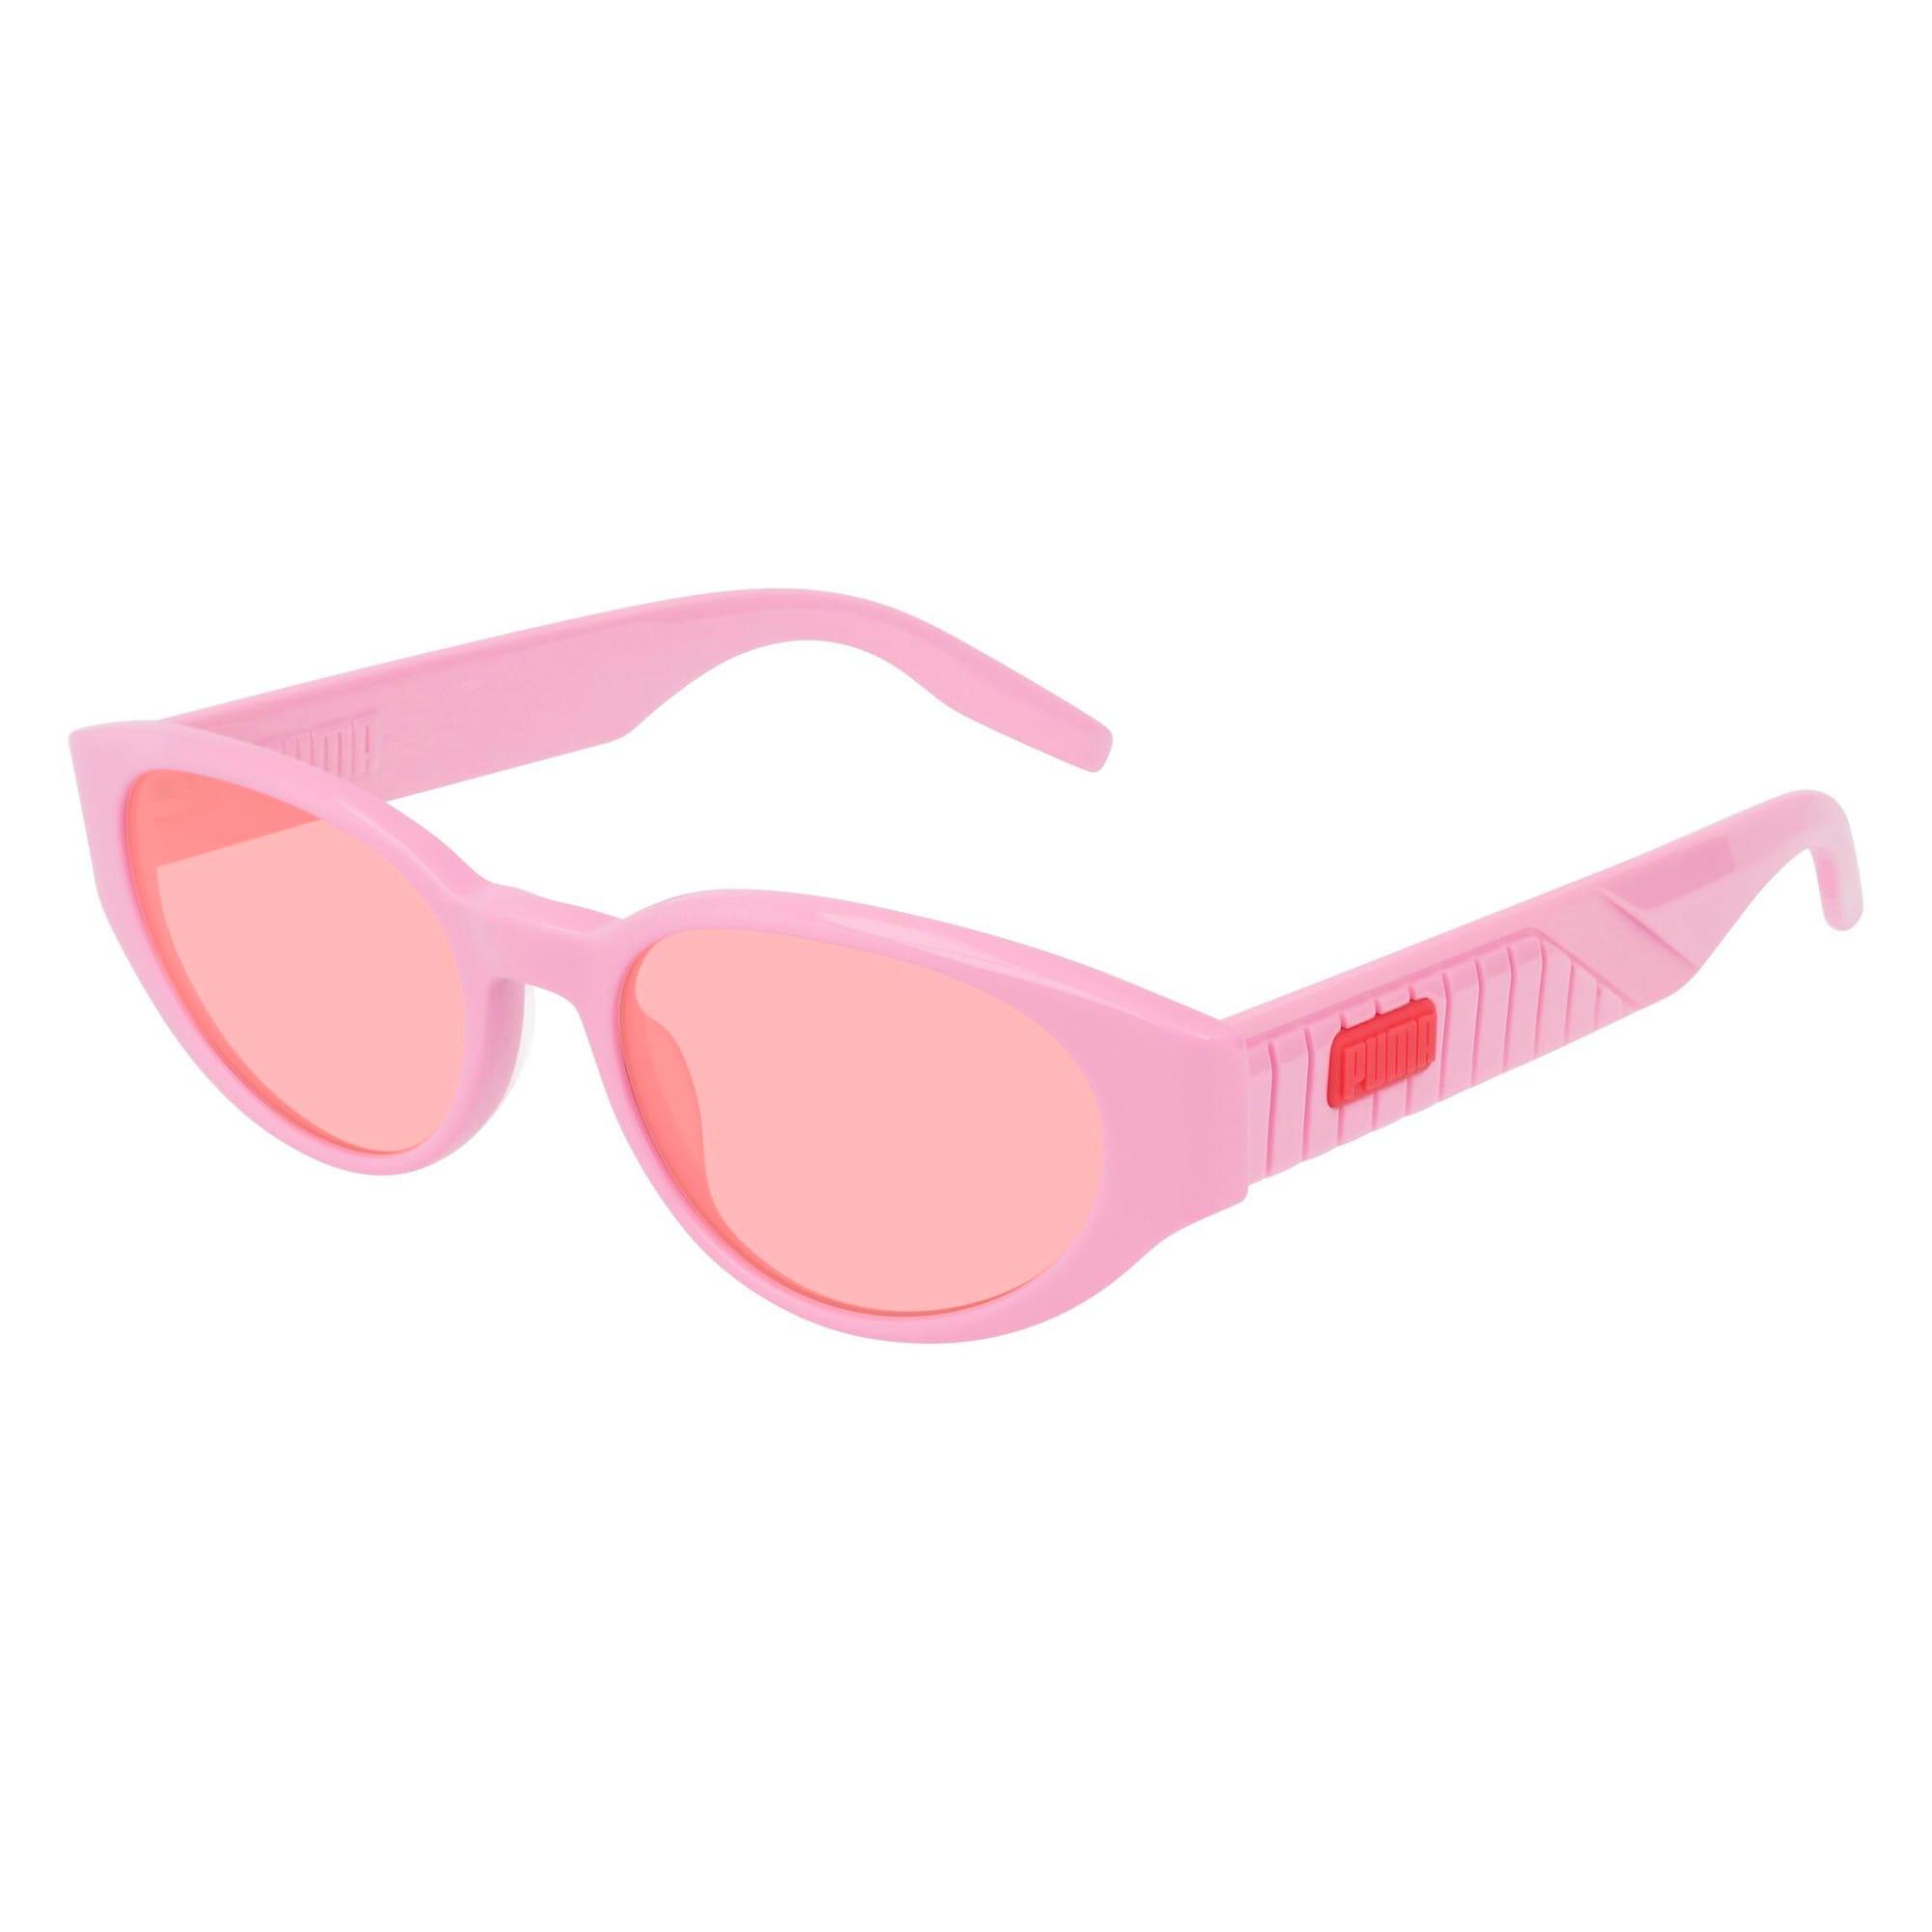 Thumbnail 1 of Victoria Beach Cat Eye Sunglasses, PINK-PINK-RED, medium